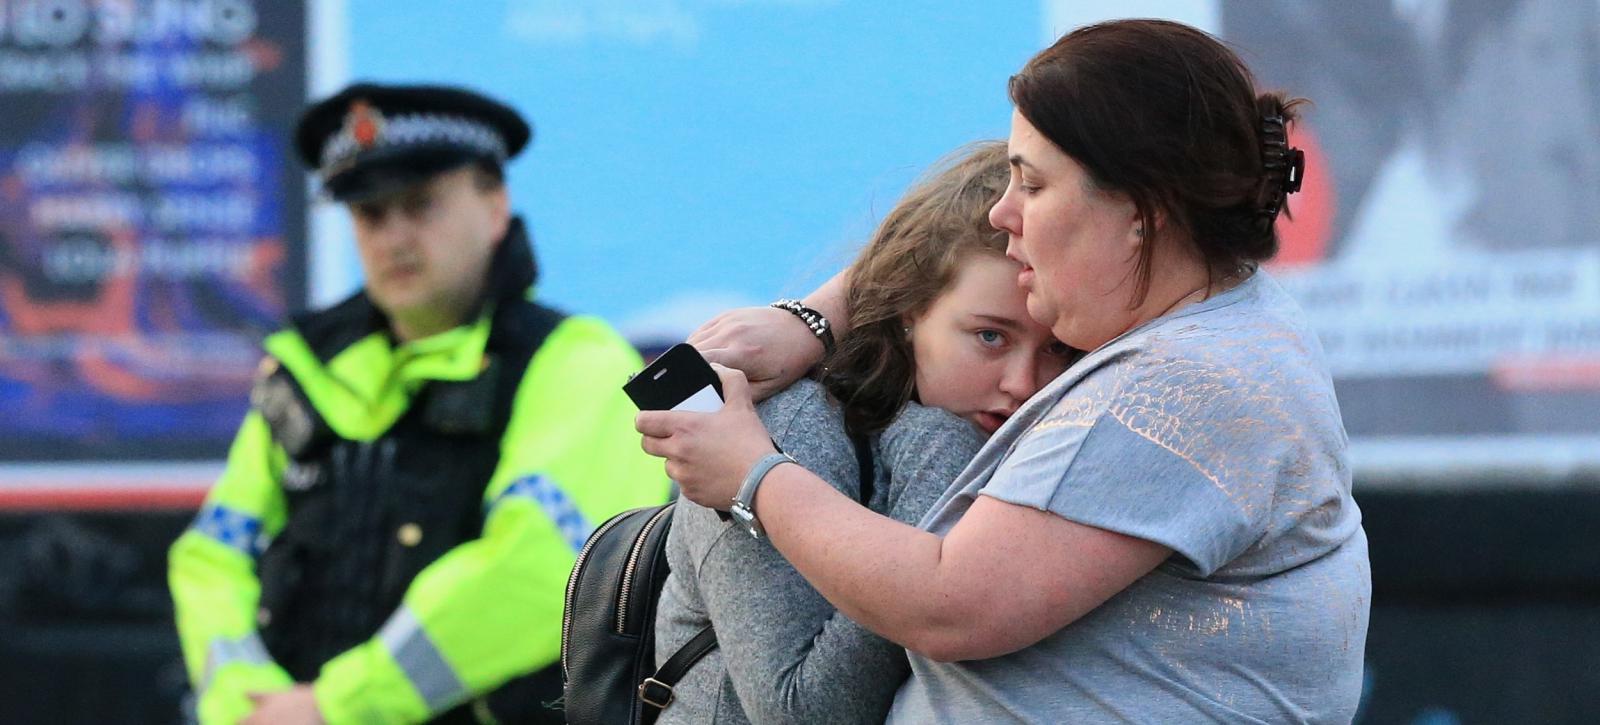 Útok v Manchesteru si vyžádal 22 mrtvých